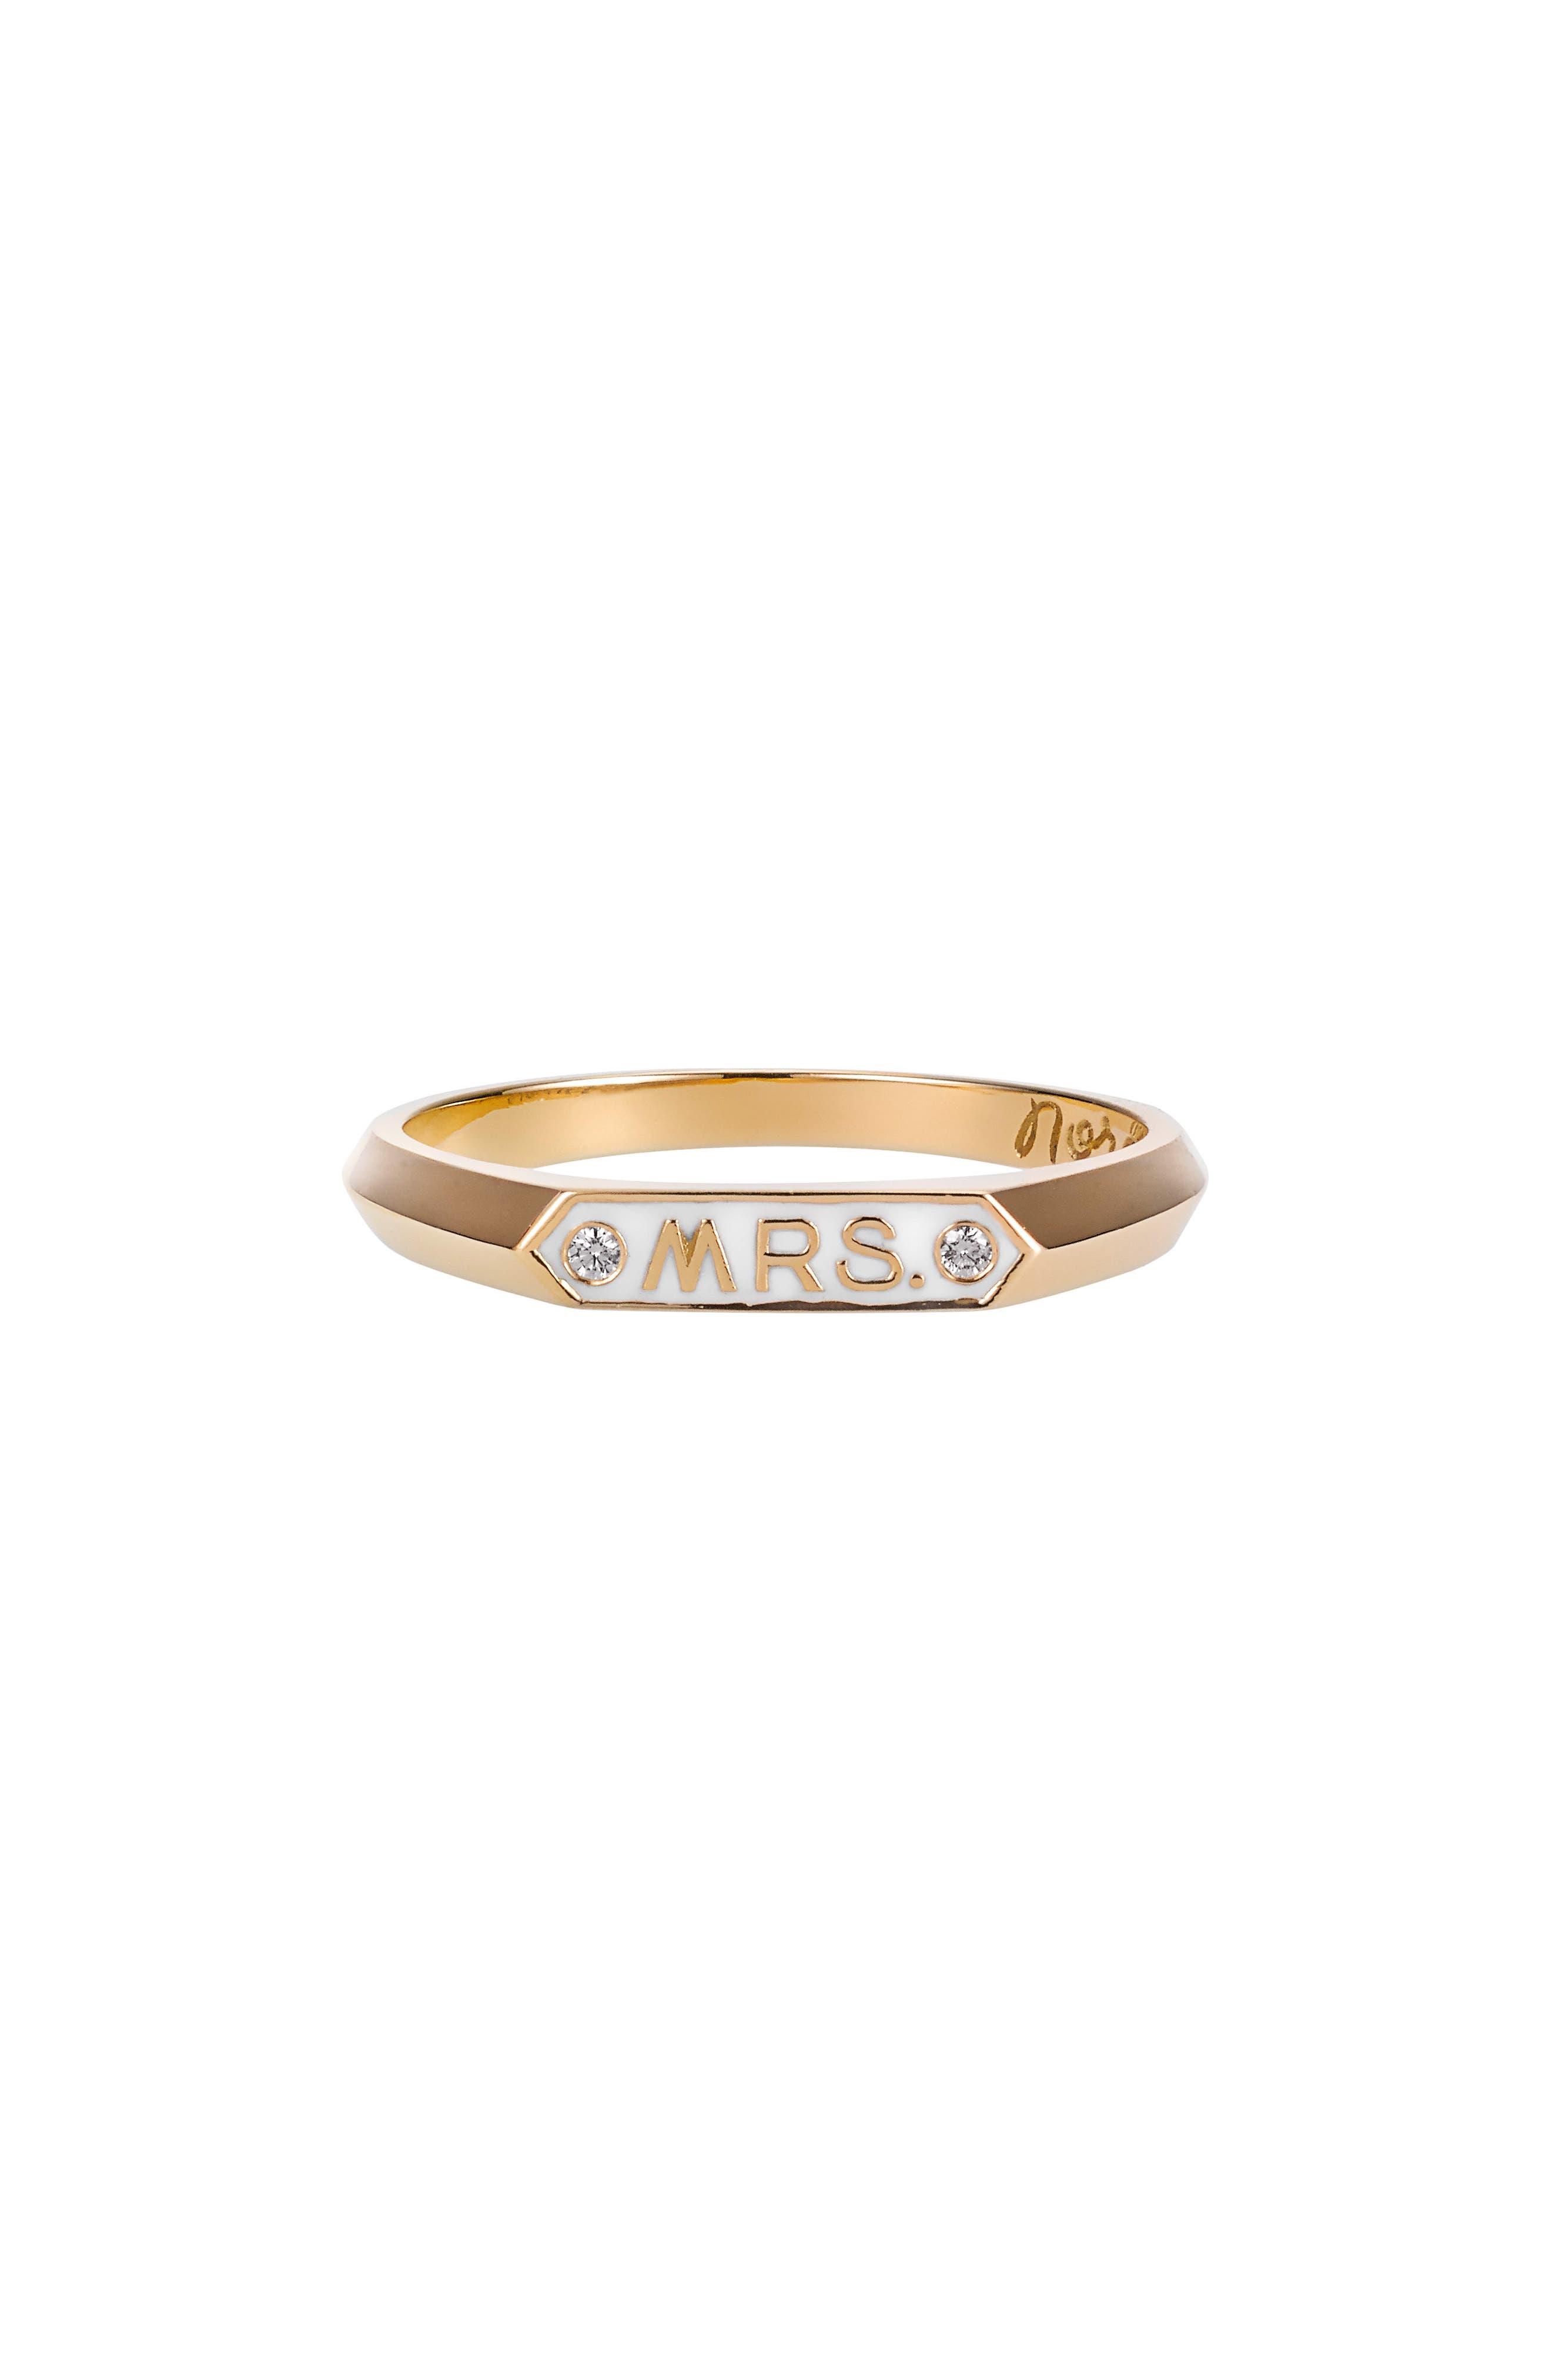 Mrs. Signet Enamel Ring,                         Main,                         color, YELLOW GOLD